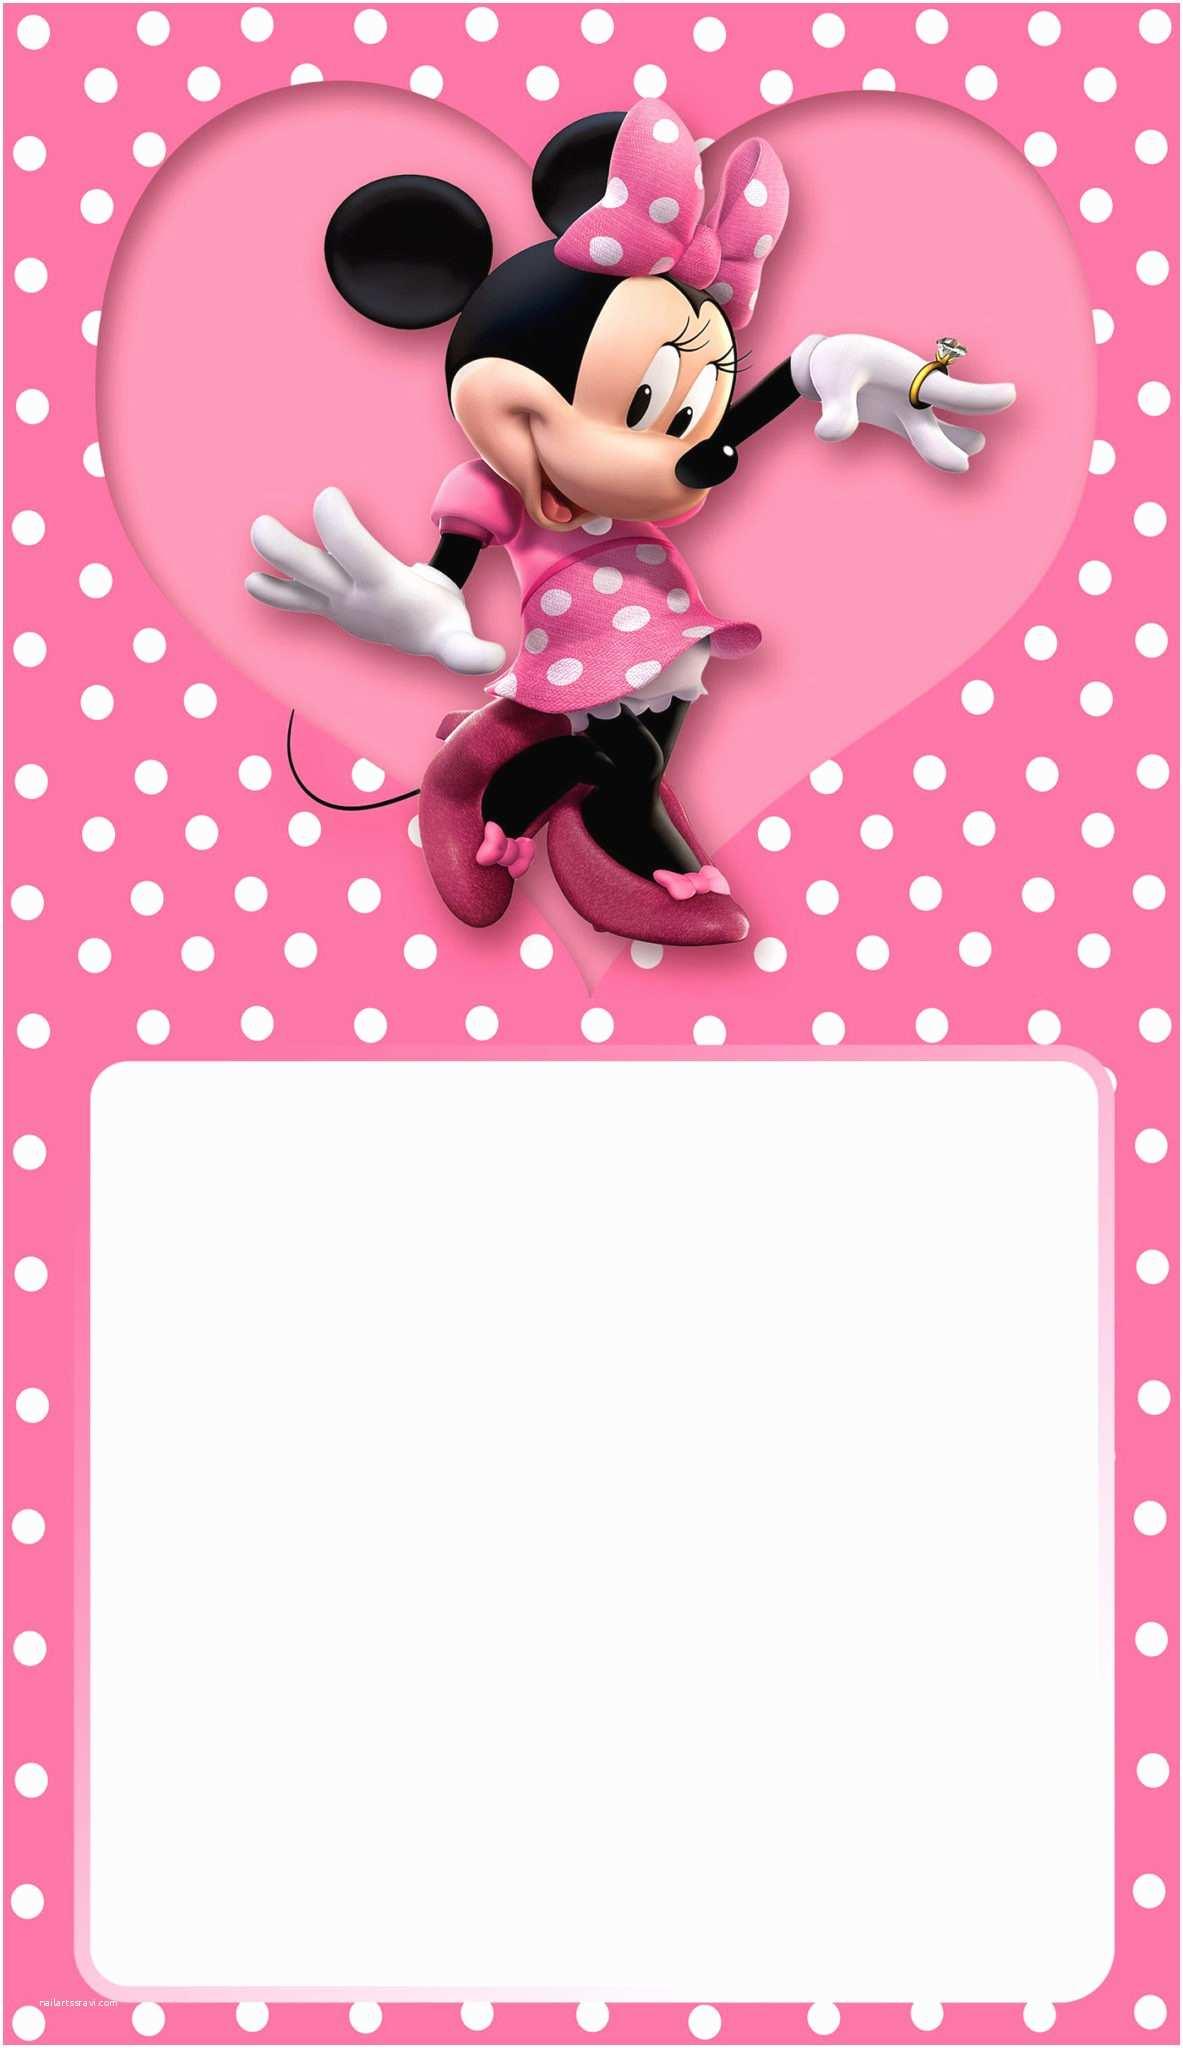 Minnie Mouse Birthday Party Invitations Minnie Mouse Birthday Party Invitation Free Printable